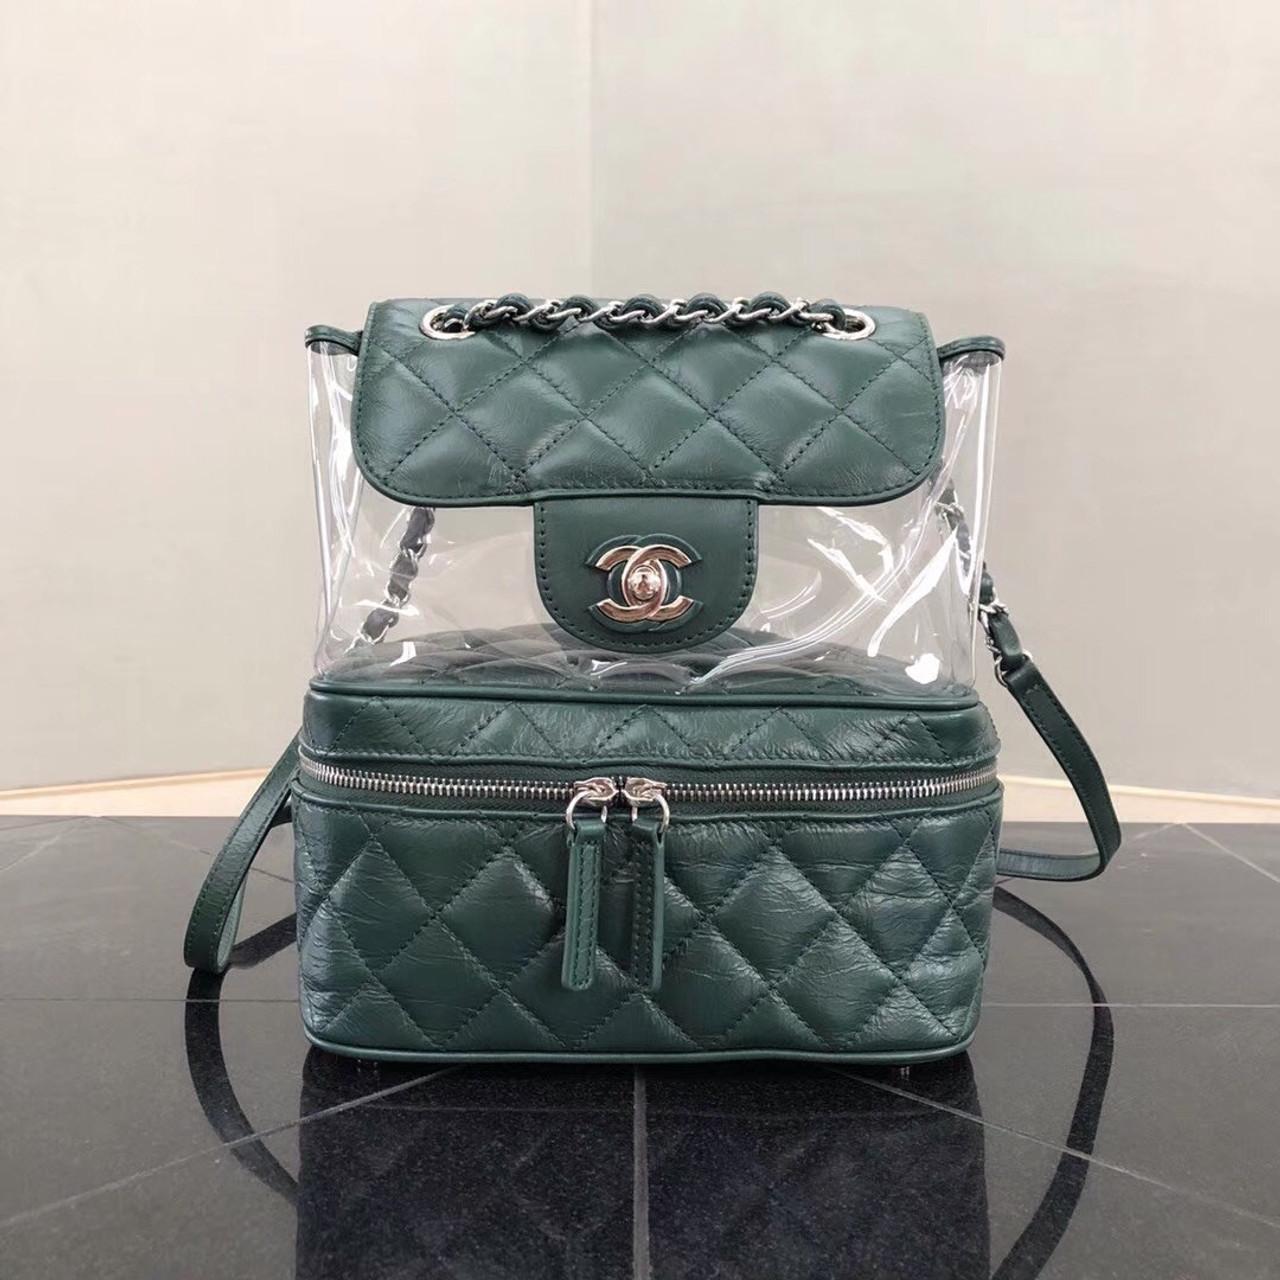 b1d2e9ab3116 Chanel PVC Flap Backpack Turquoise - Bella Vita Moda